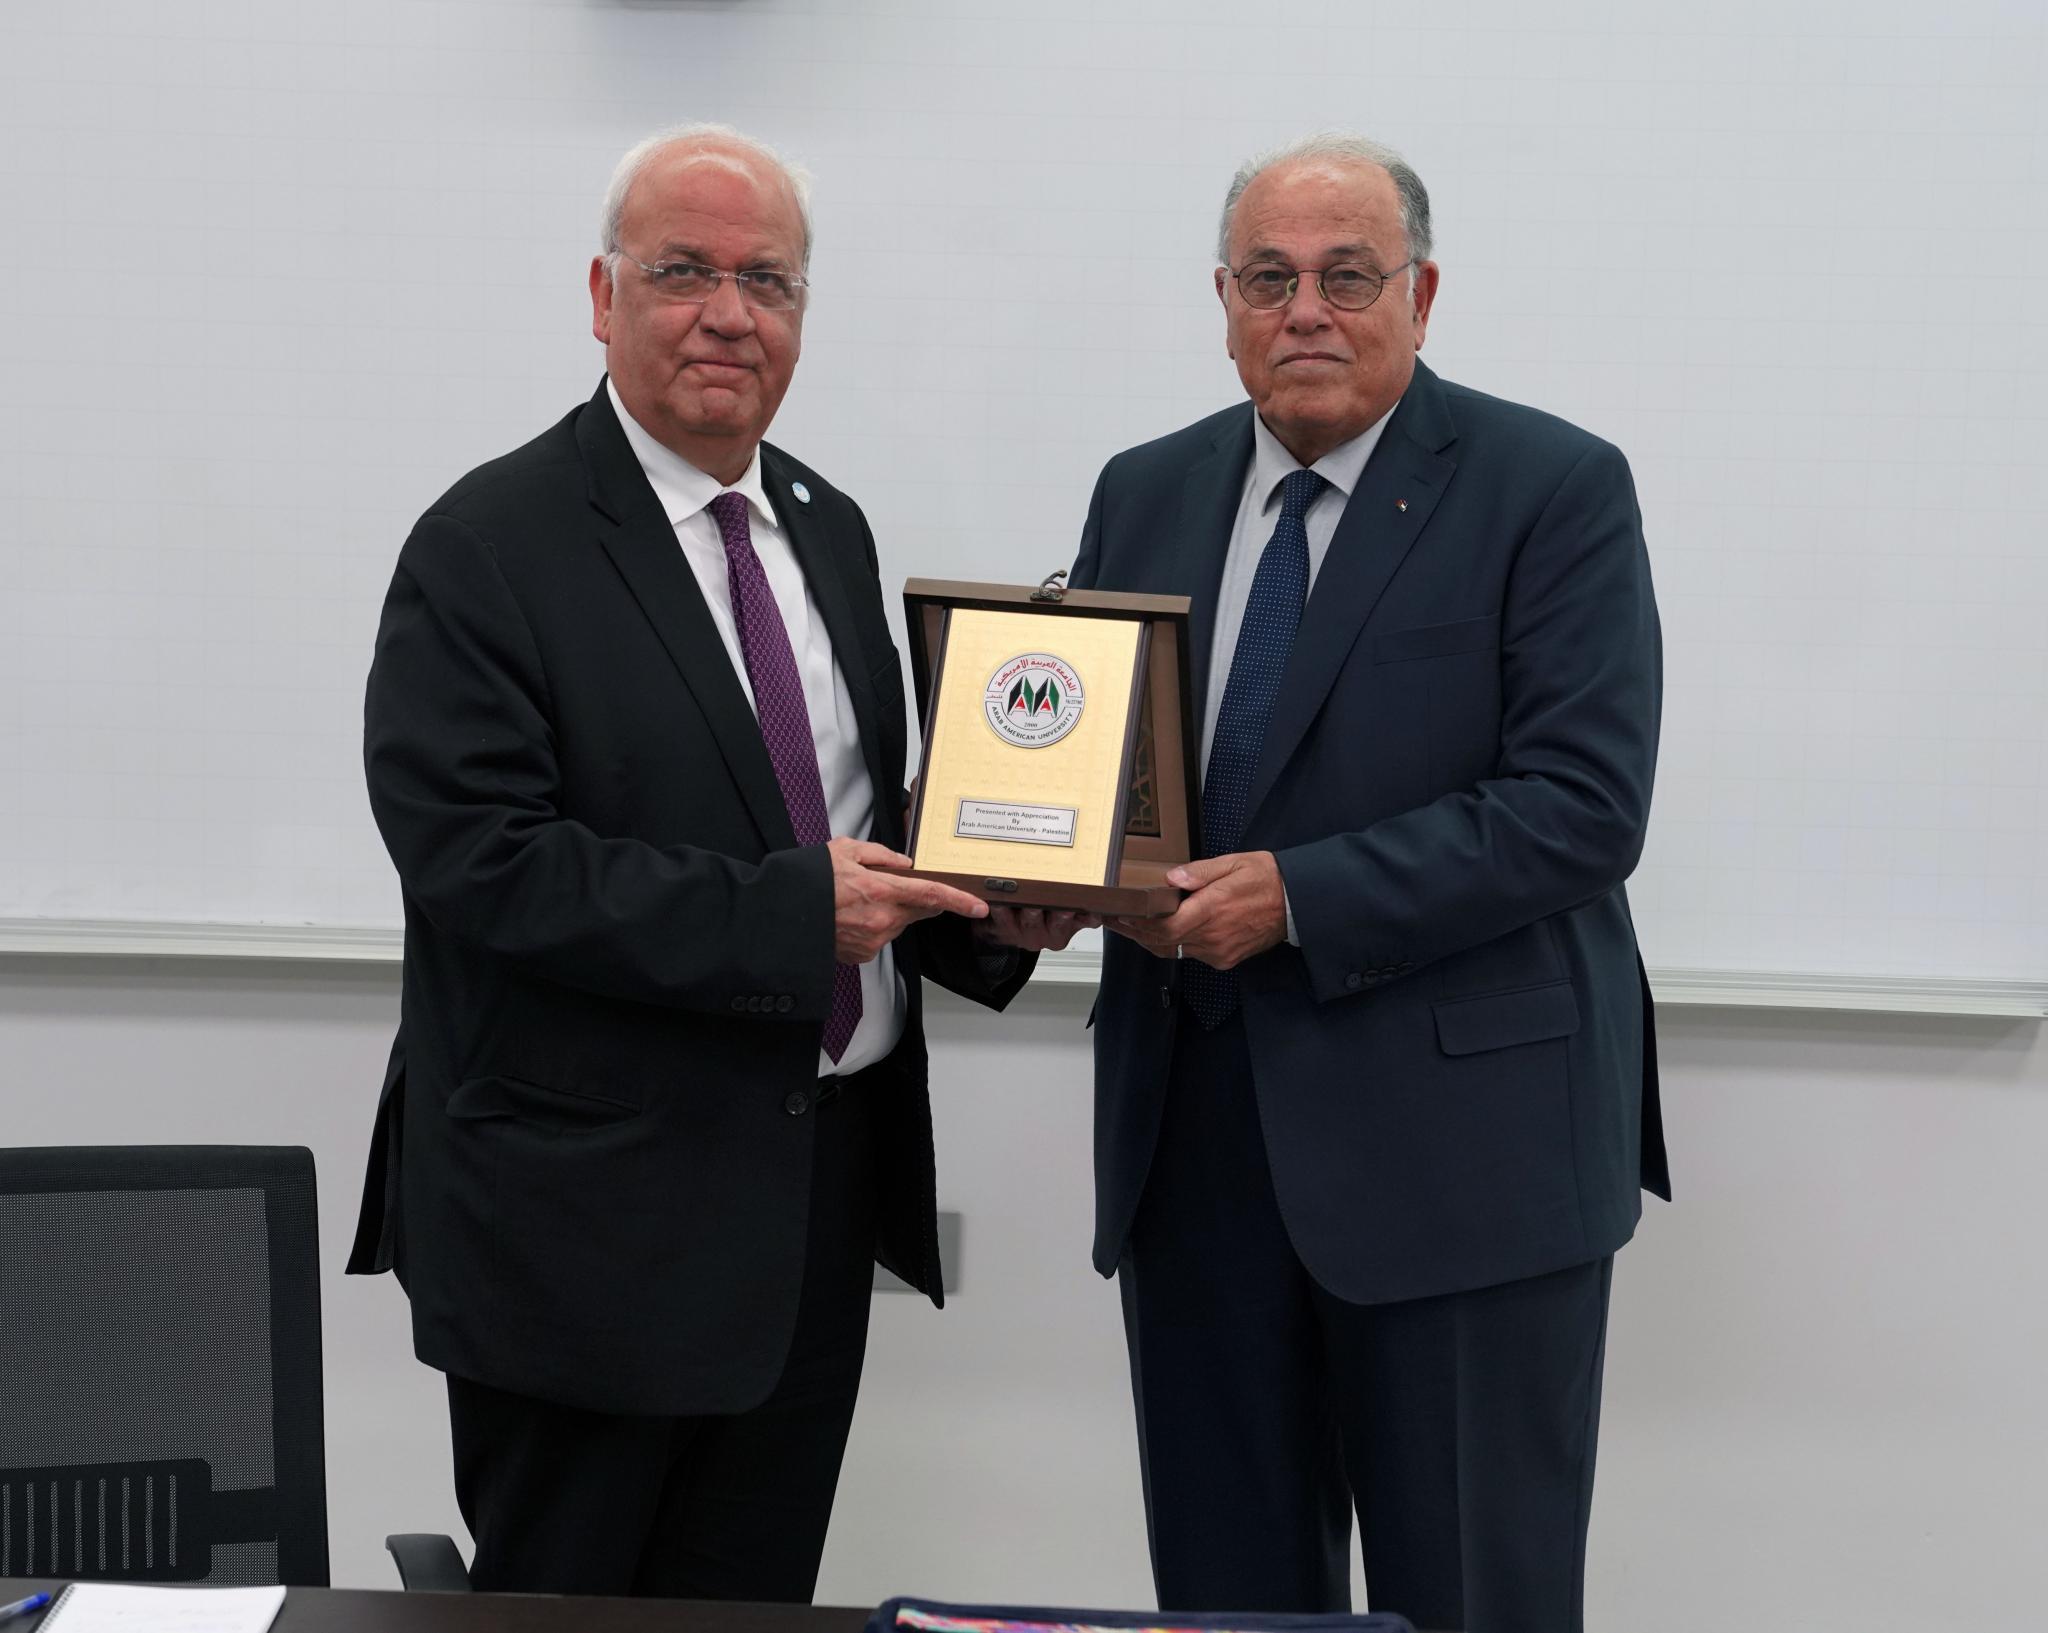 AAUP president honoring Dr. Sa'eb Iriqat